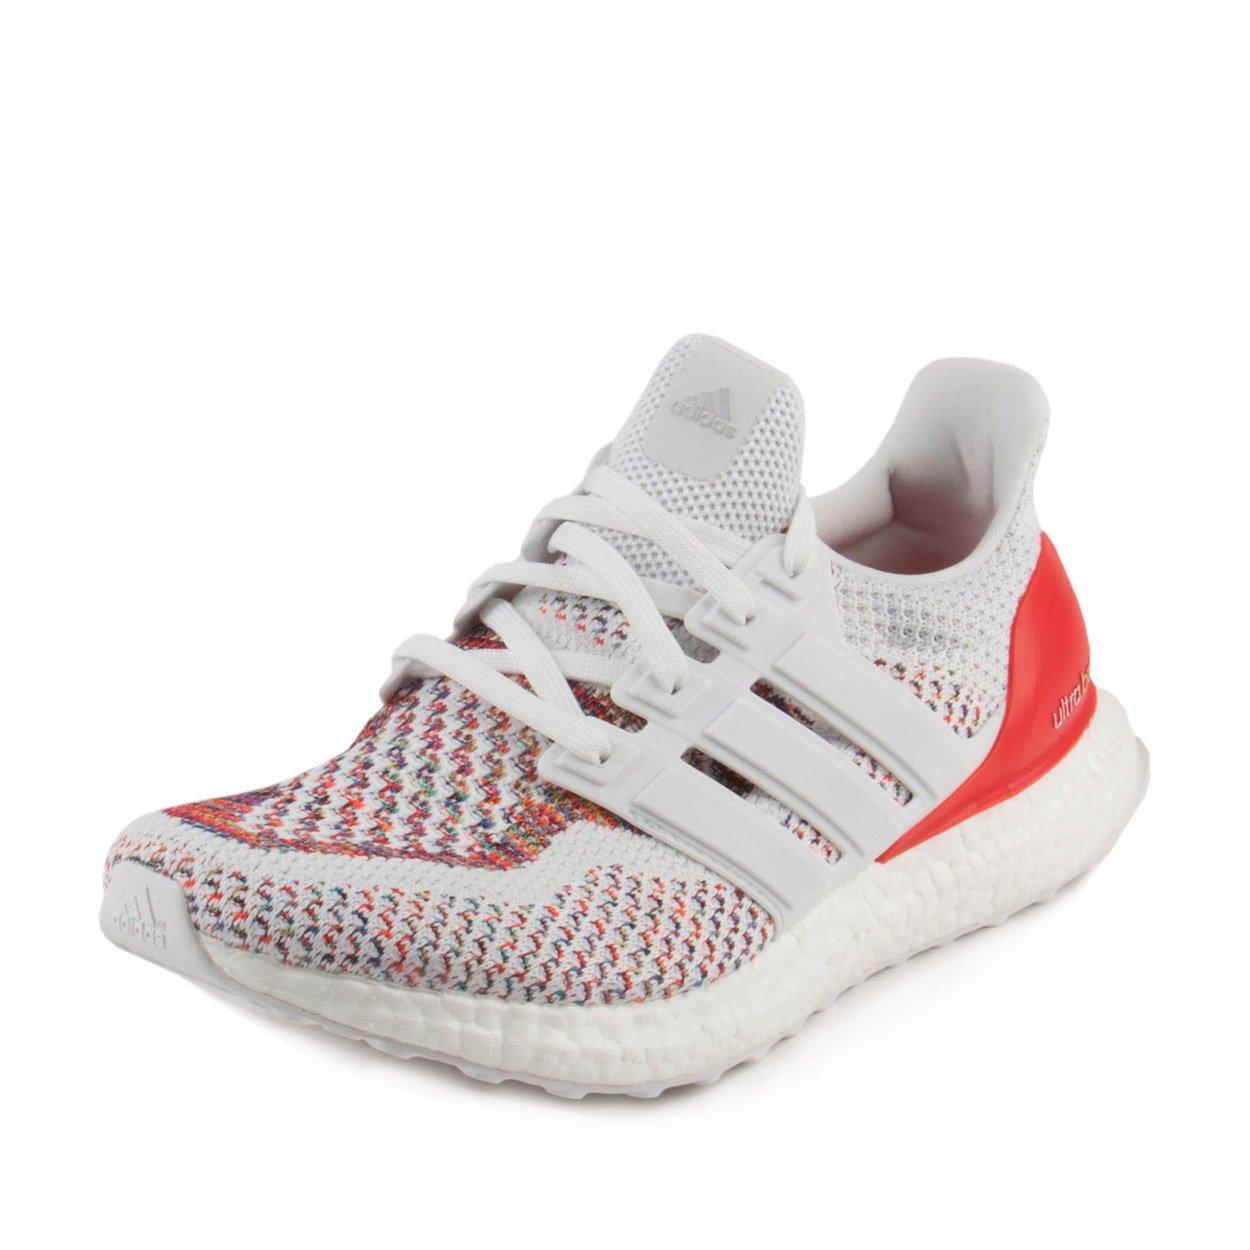 6c925bb6d ... coupon code for adidas mens ultraboost m running shoe white white poppy  9 m us amazon